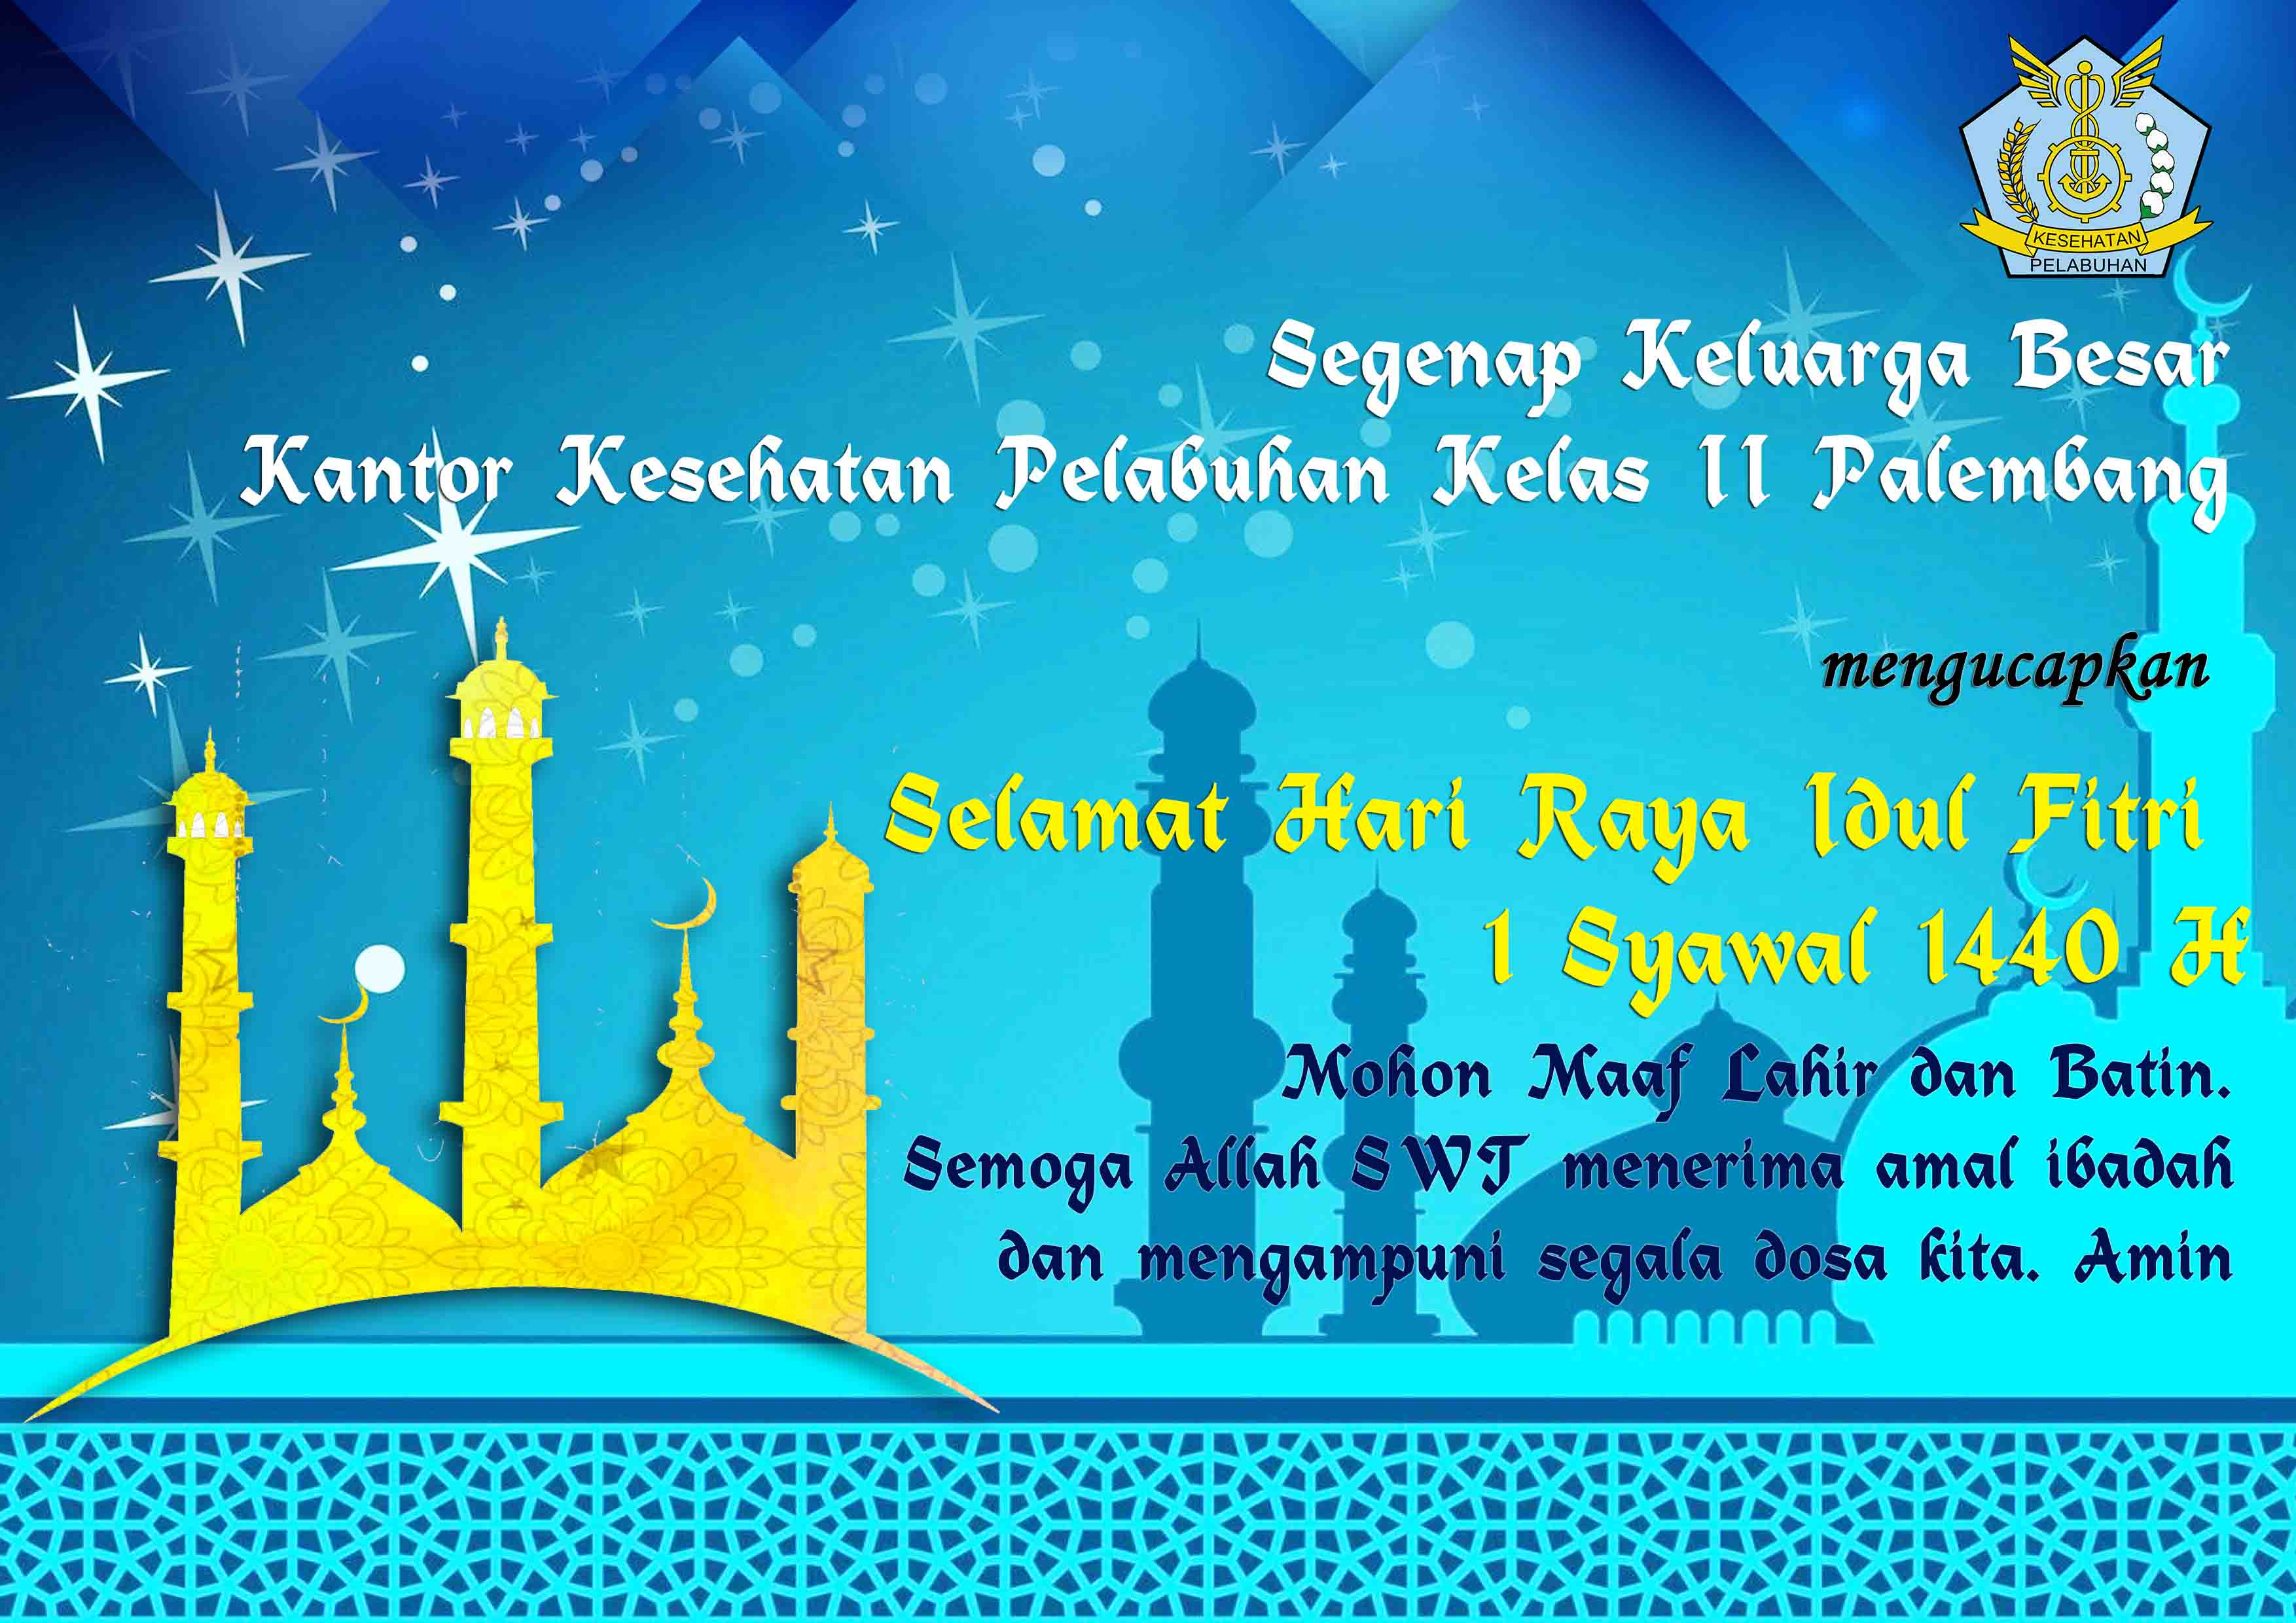 Selamat Hari Raya Idul Fitri 1440 H, Mohon Maaf Lahir dan Batin